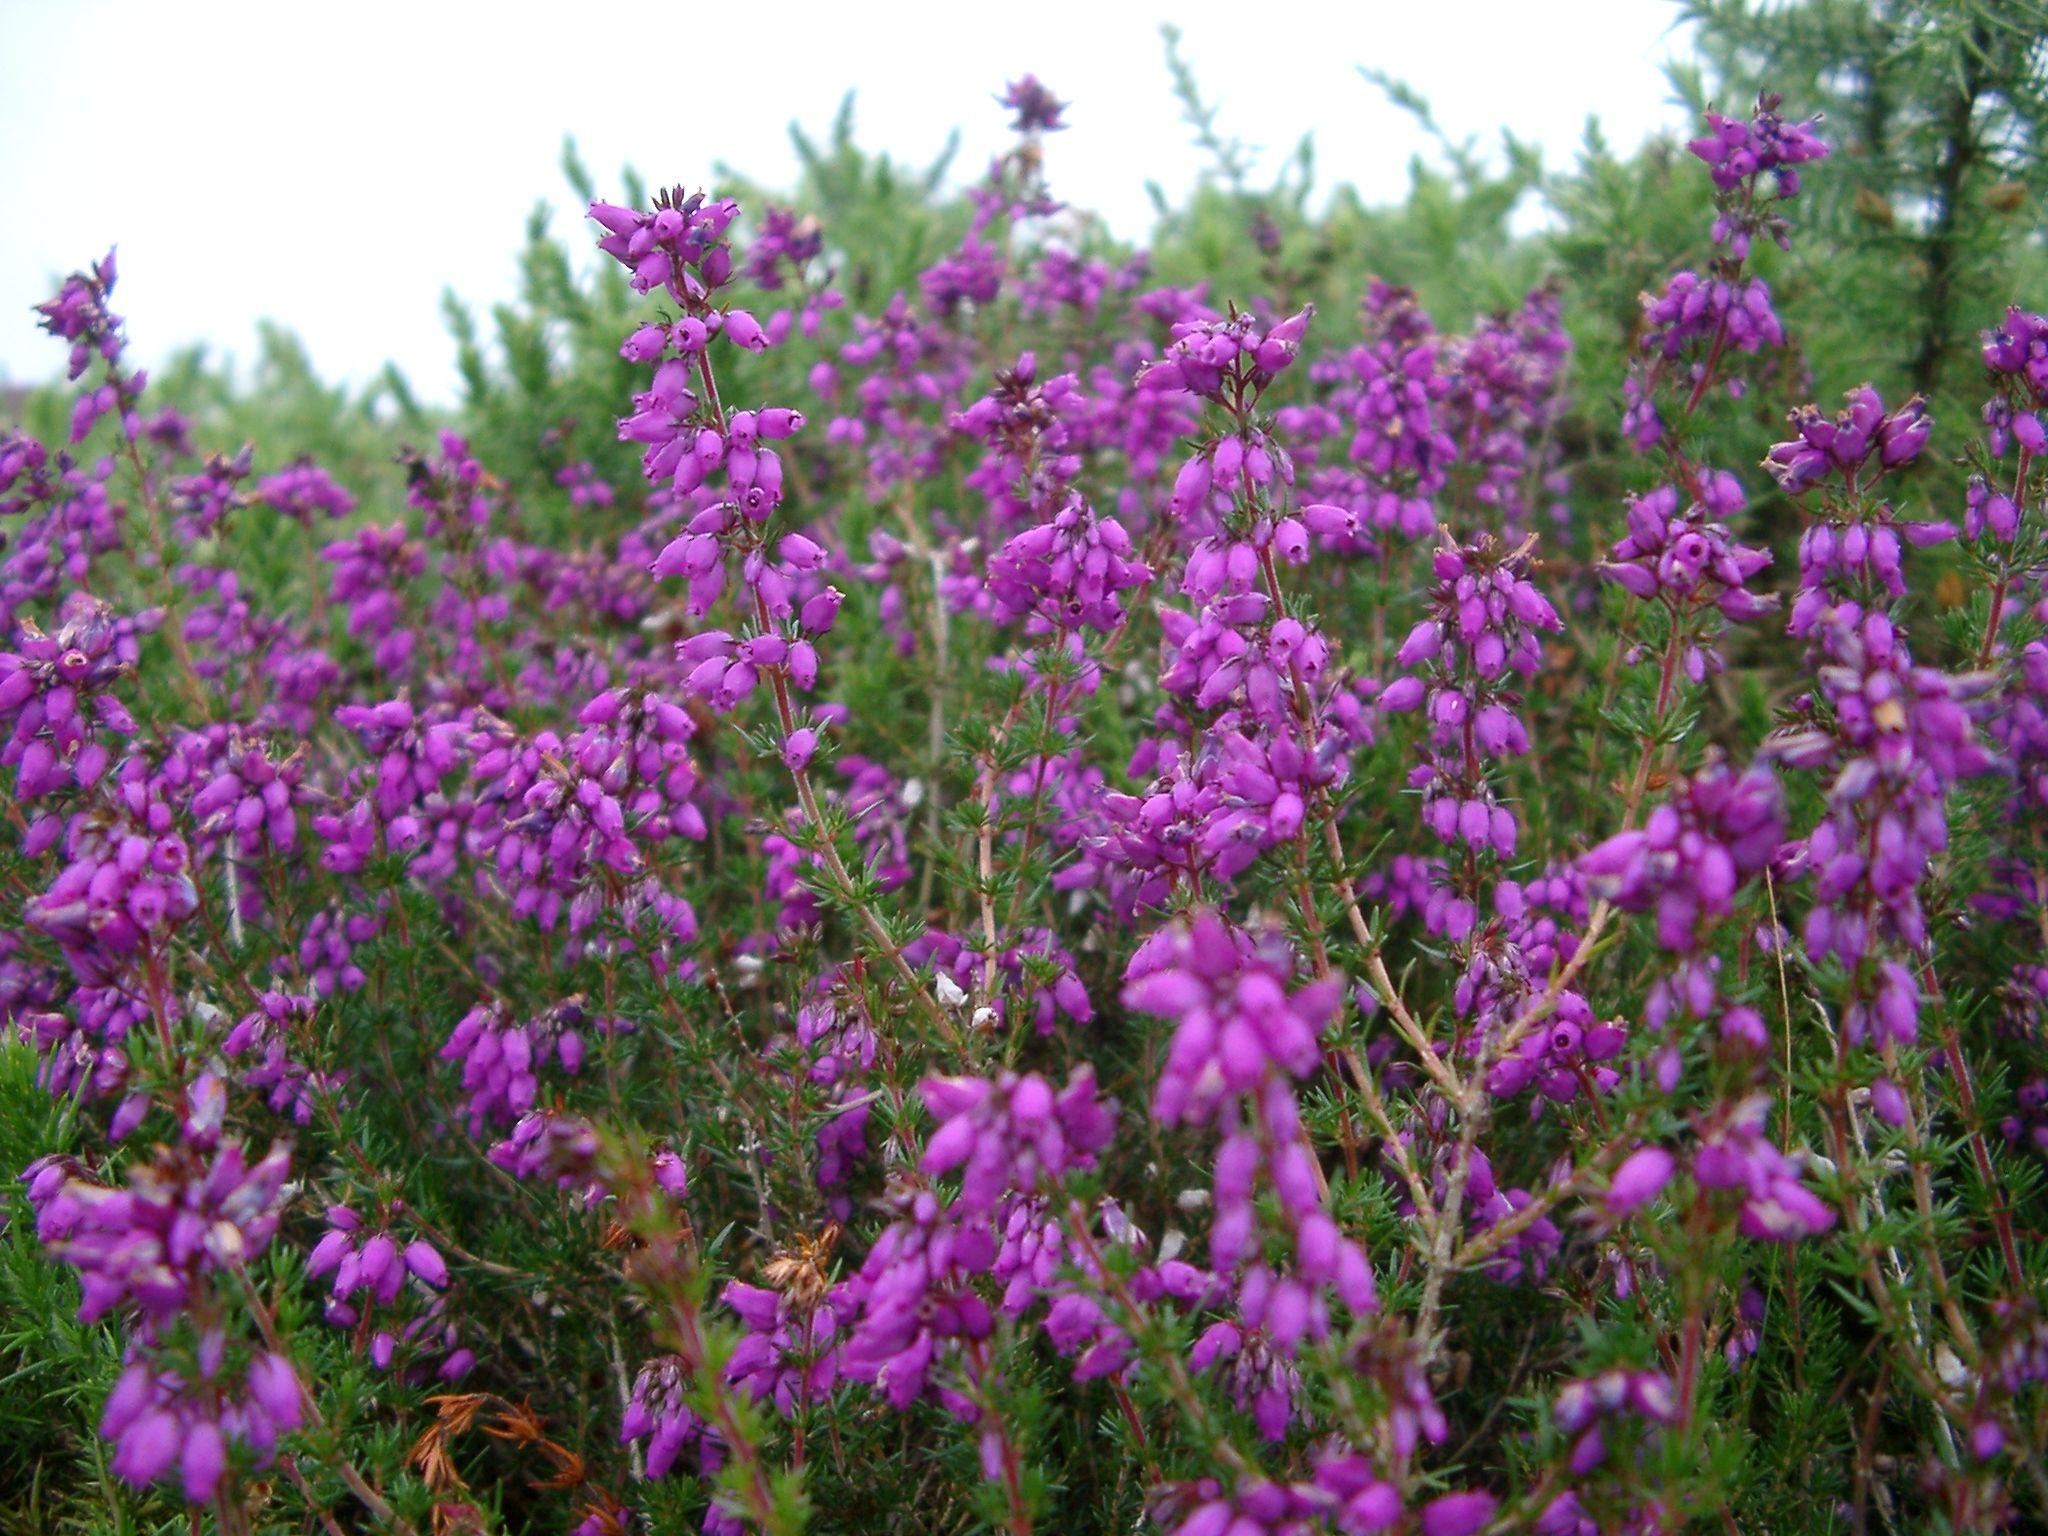 Google Image Result For Http Www Photoeverywhere Co Uk Britain Ukwild Heather3912 Jpg Flowering Bushes Scent Garden Flowers